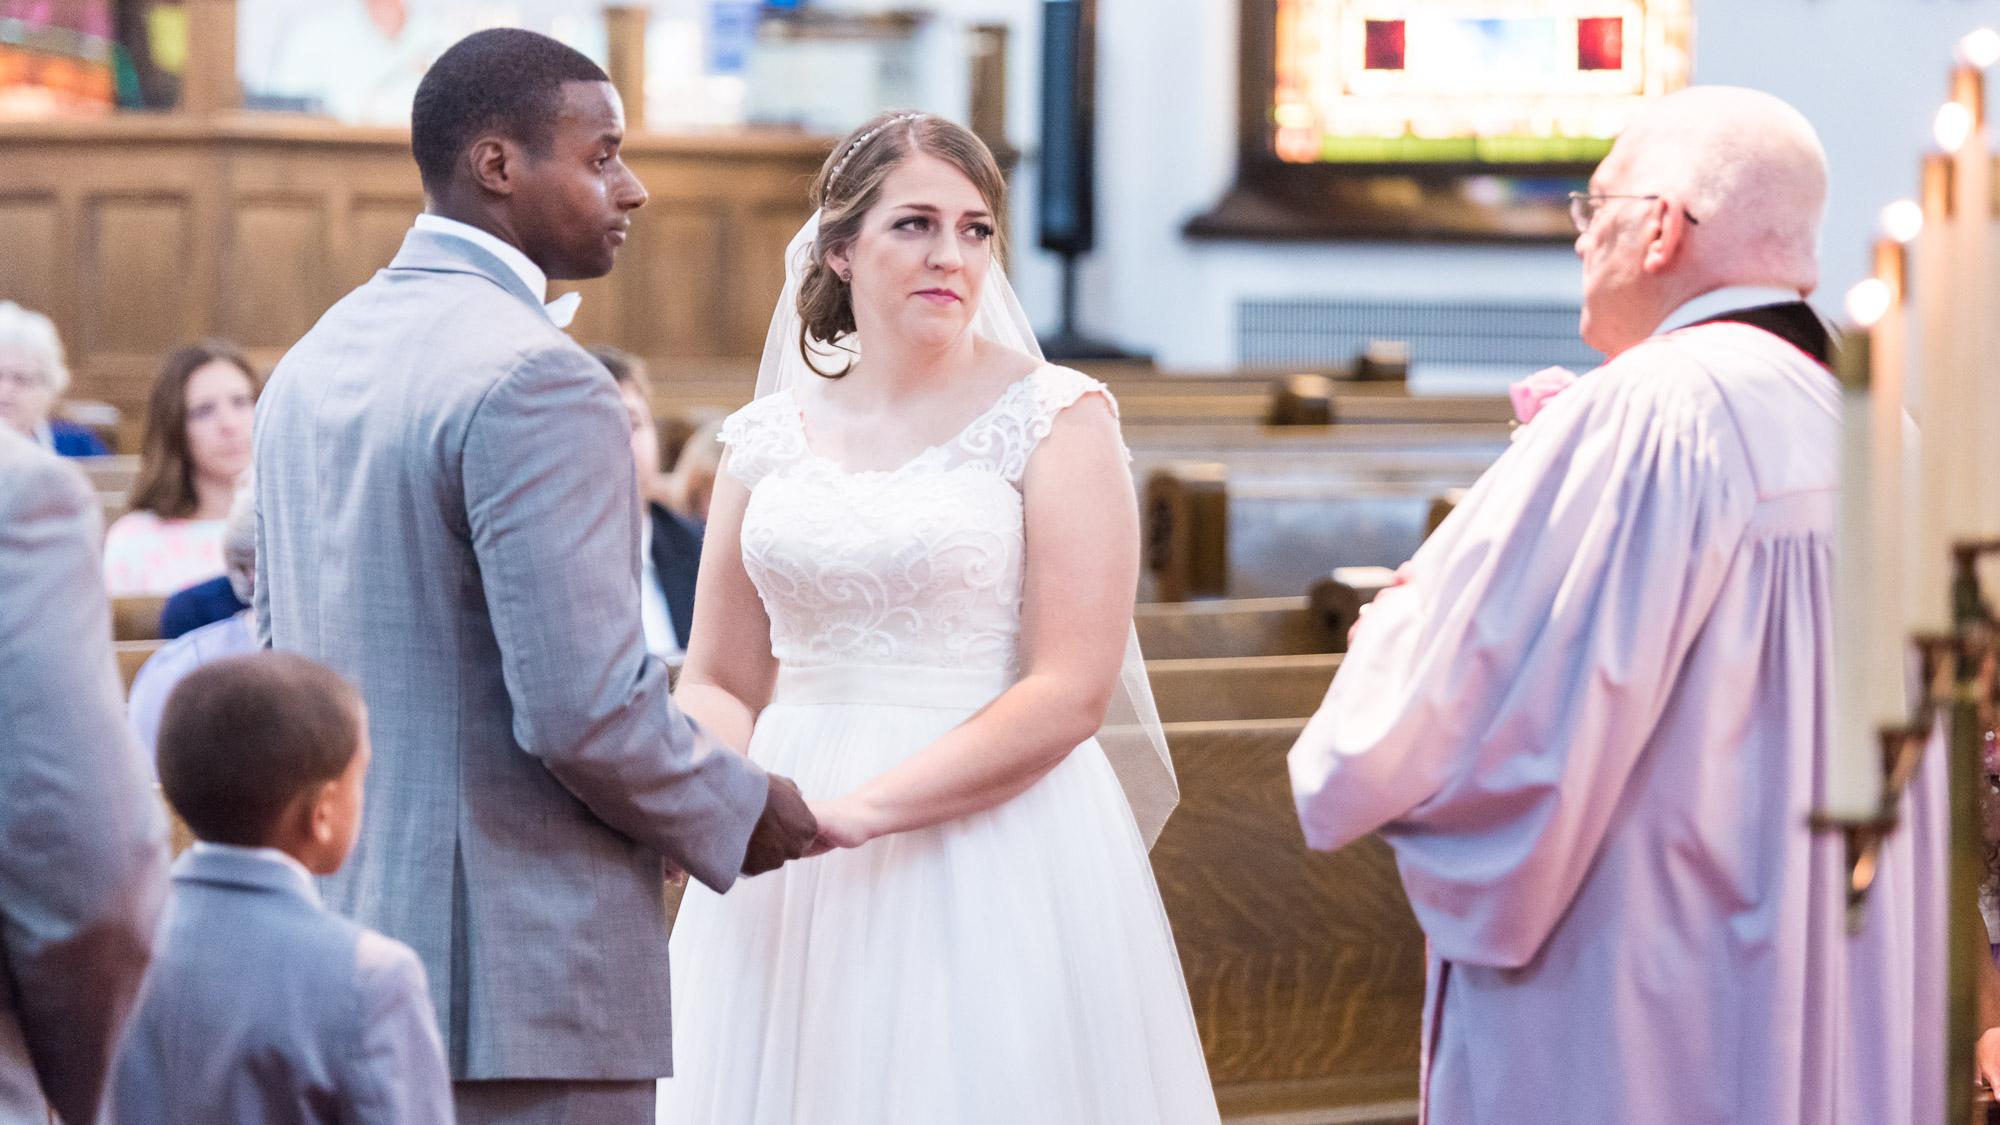 Bride_and_Groom_Wedding_Ceremony.jpg